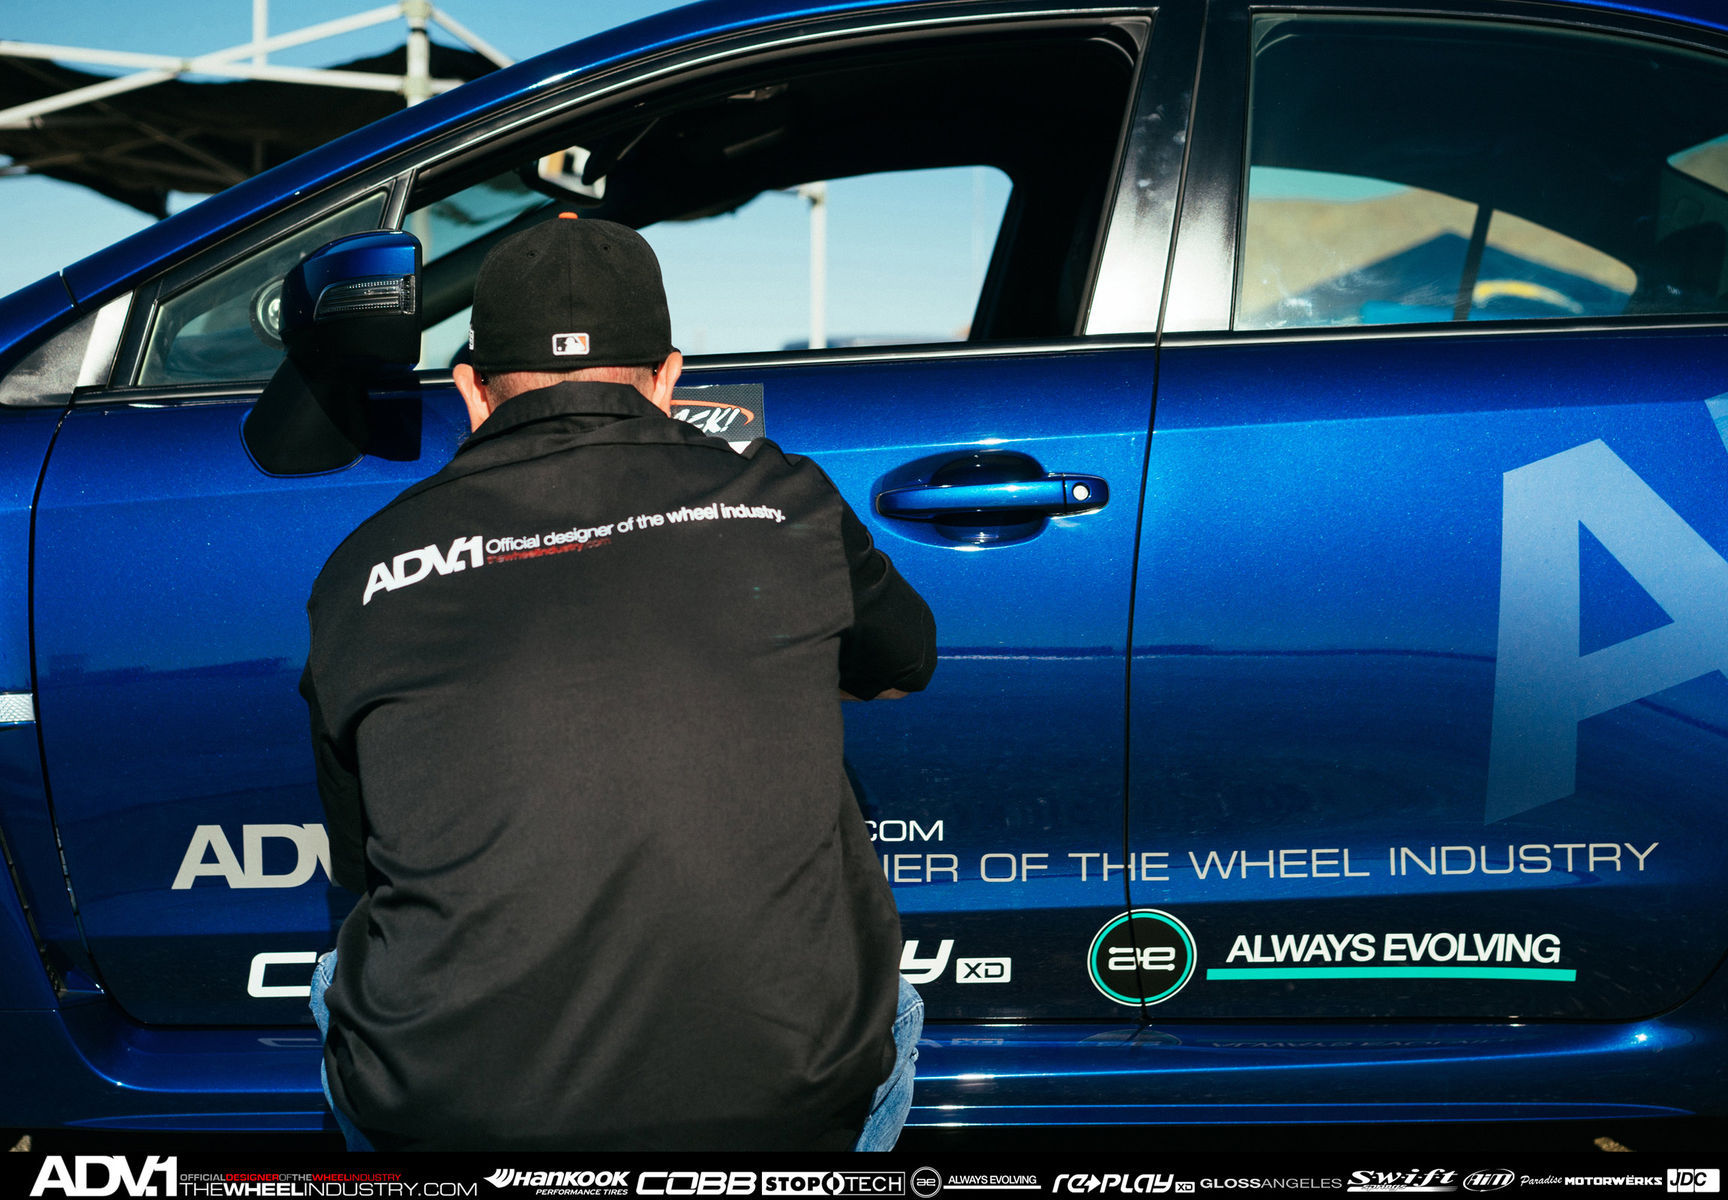 2015 Subaru STI | SUBARU STI ADV5S REDLINE TIME ATTACK: ROUND 2 - BIG WILLOW - APRIL 12